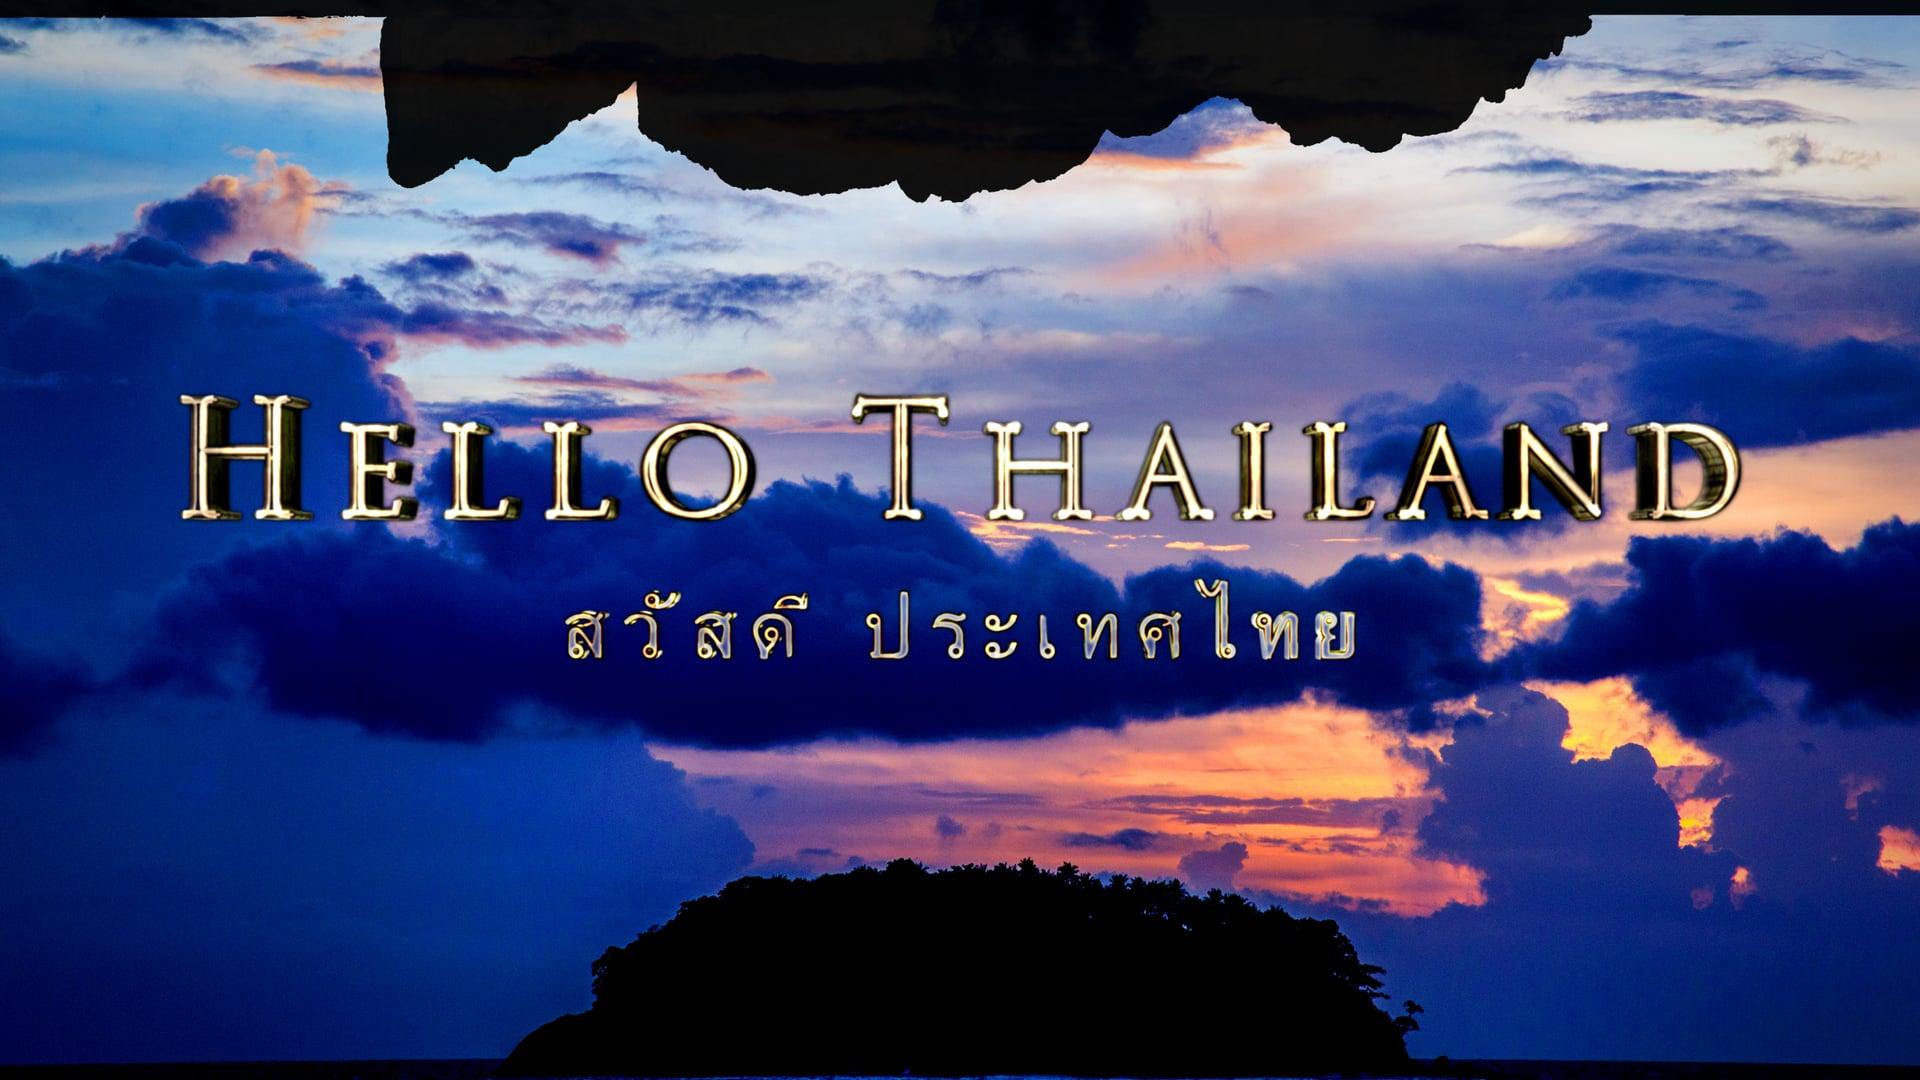 HELLO THAILAND   สวัสดี ประเทศไทย - In 4K